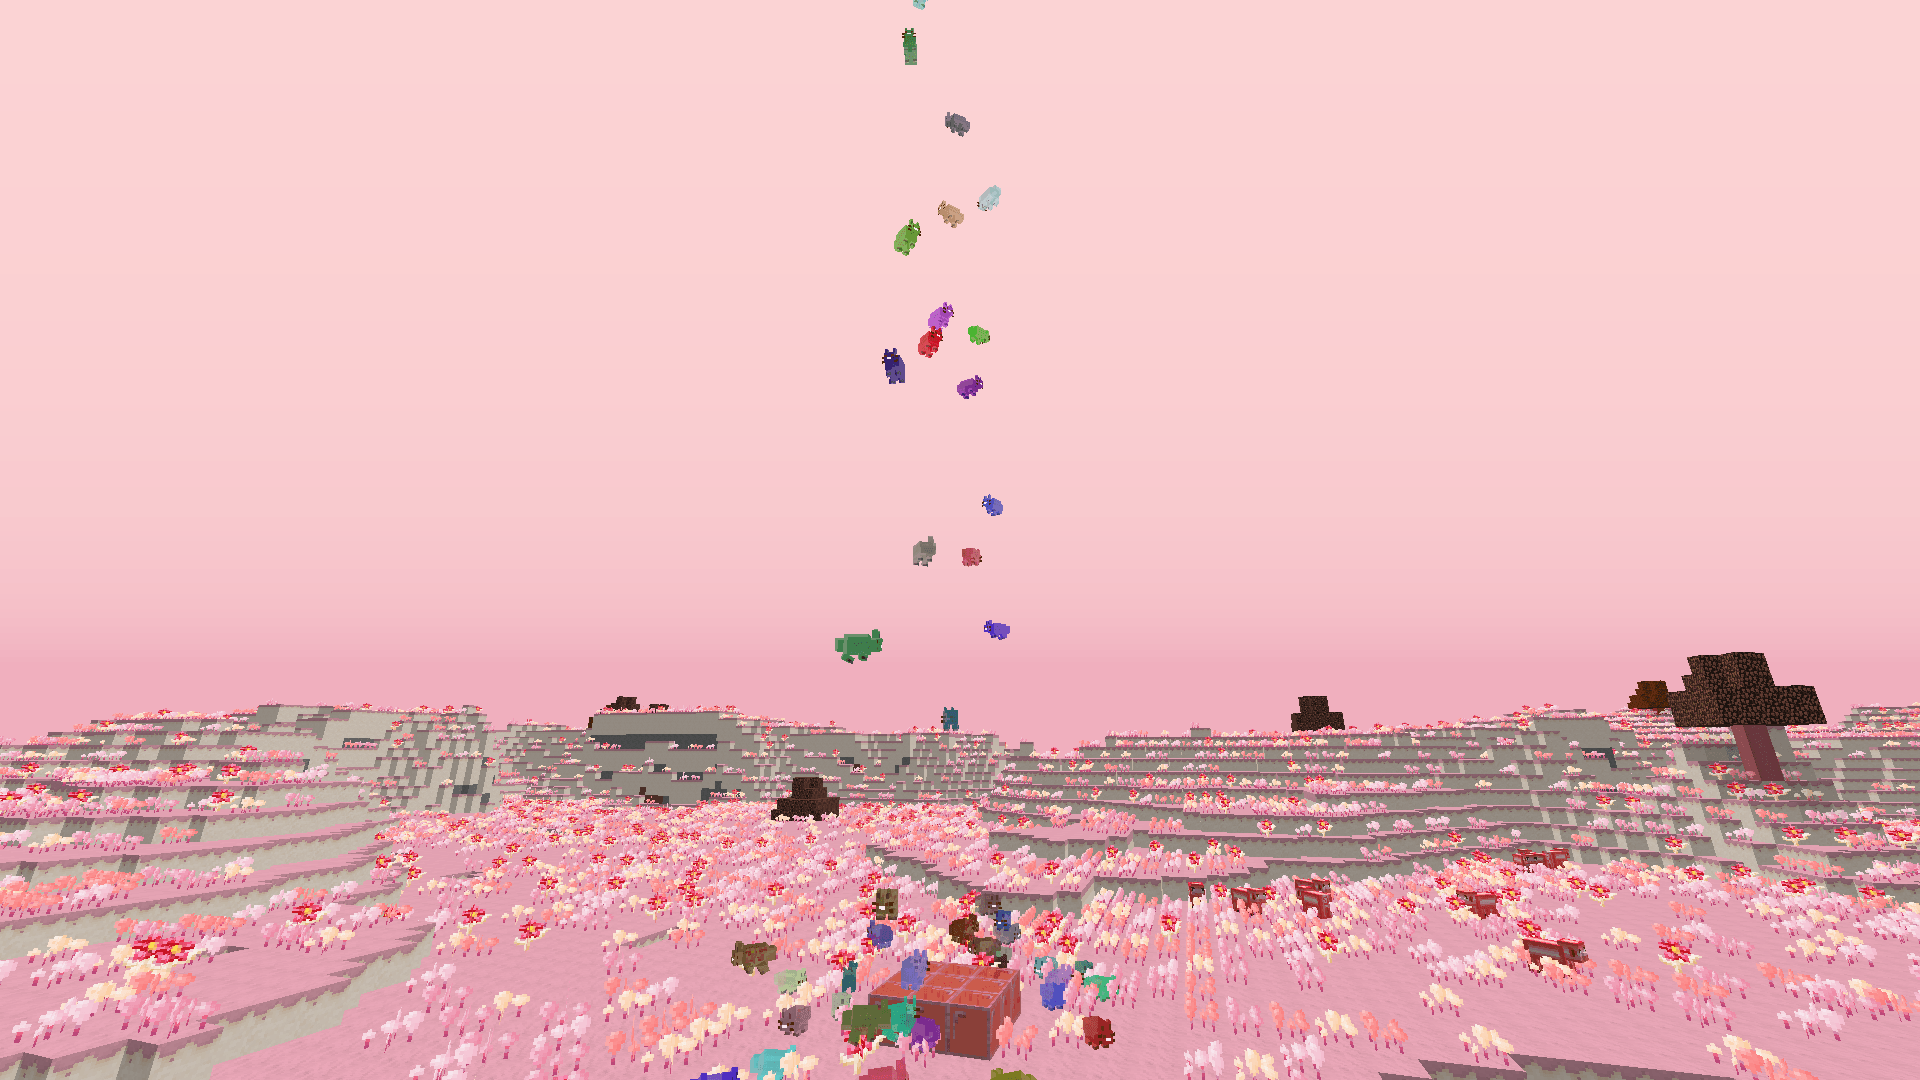 2015-02-23_00.38.44